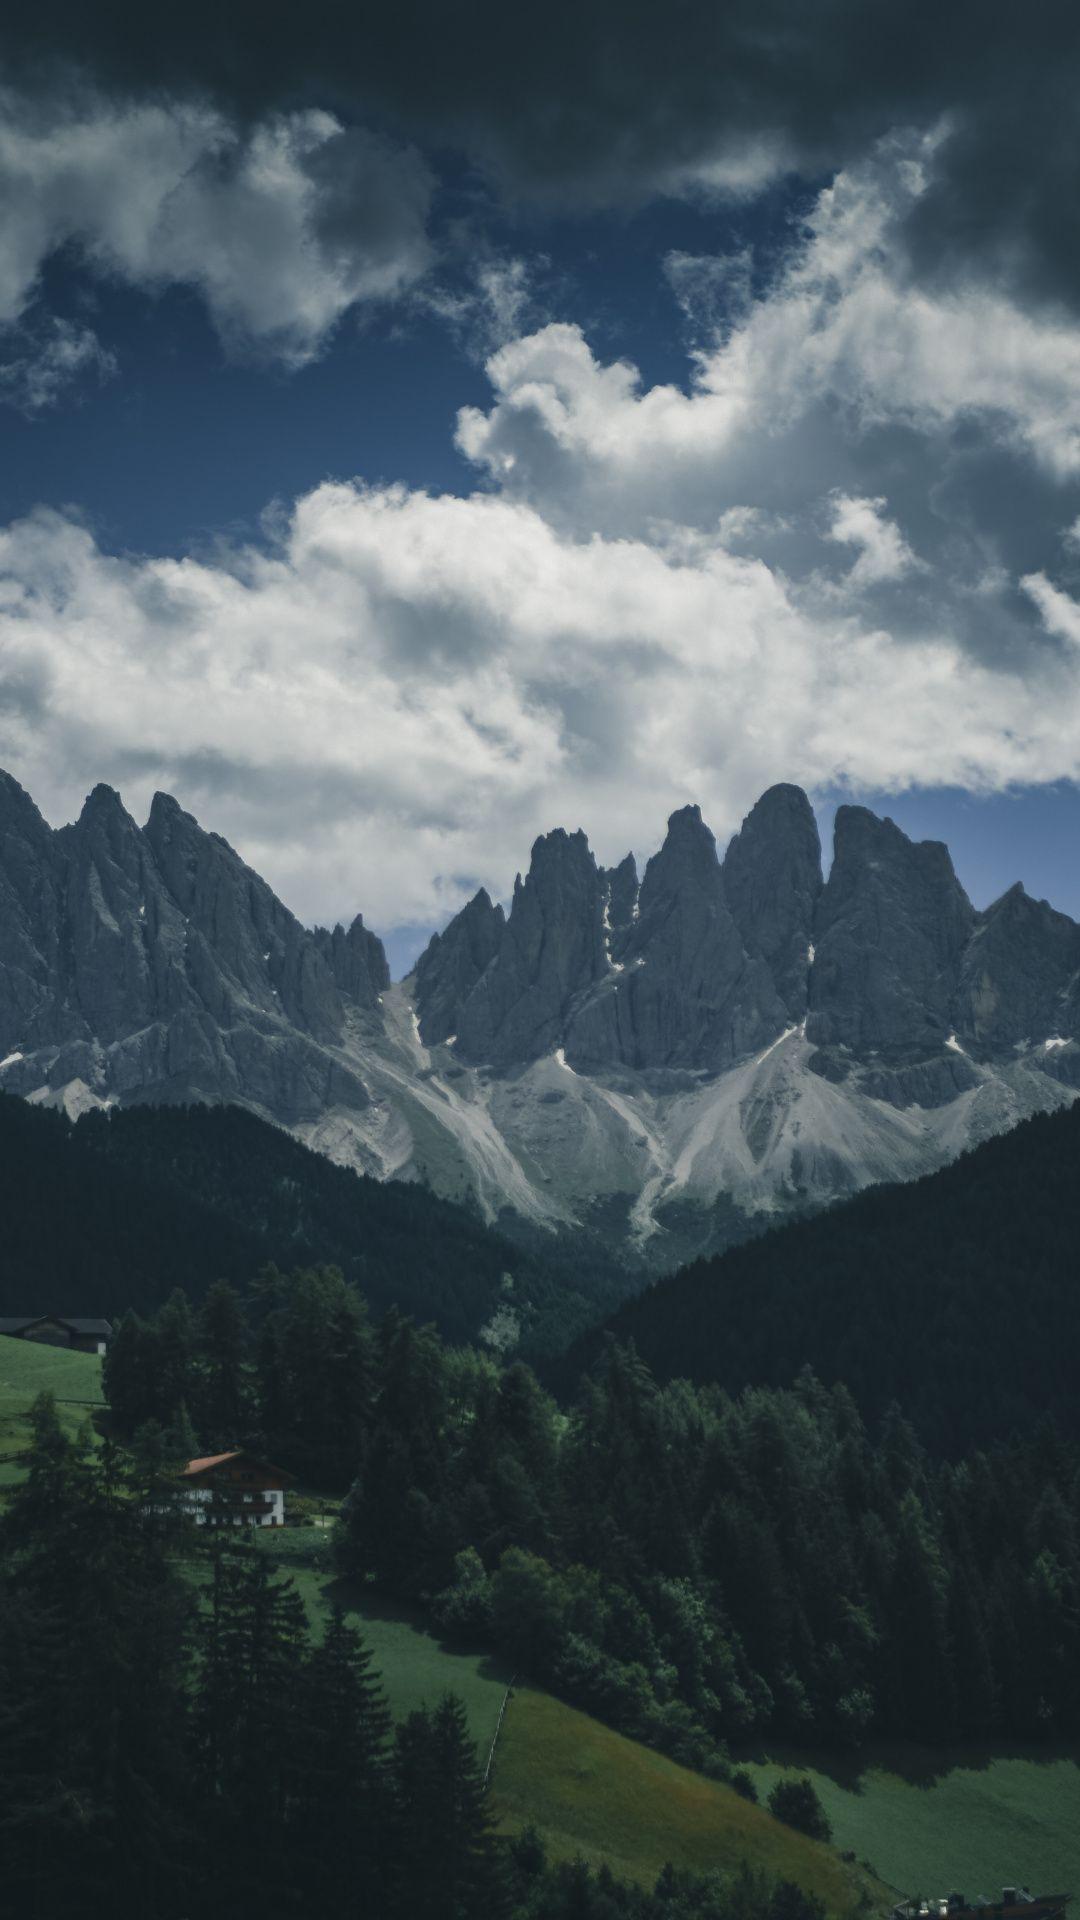 Downaload Mountains range, landscape, greenery wallpaper